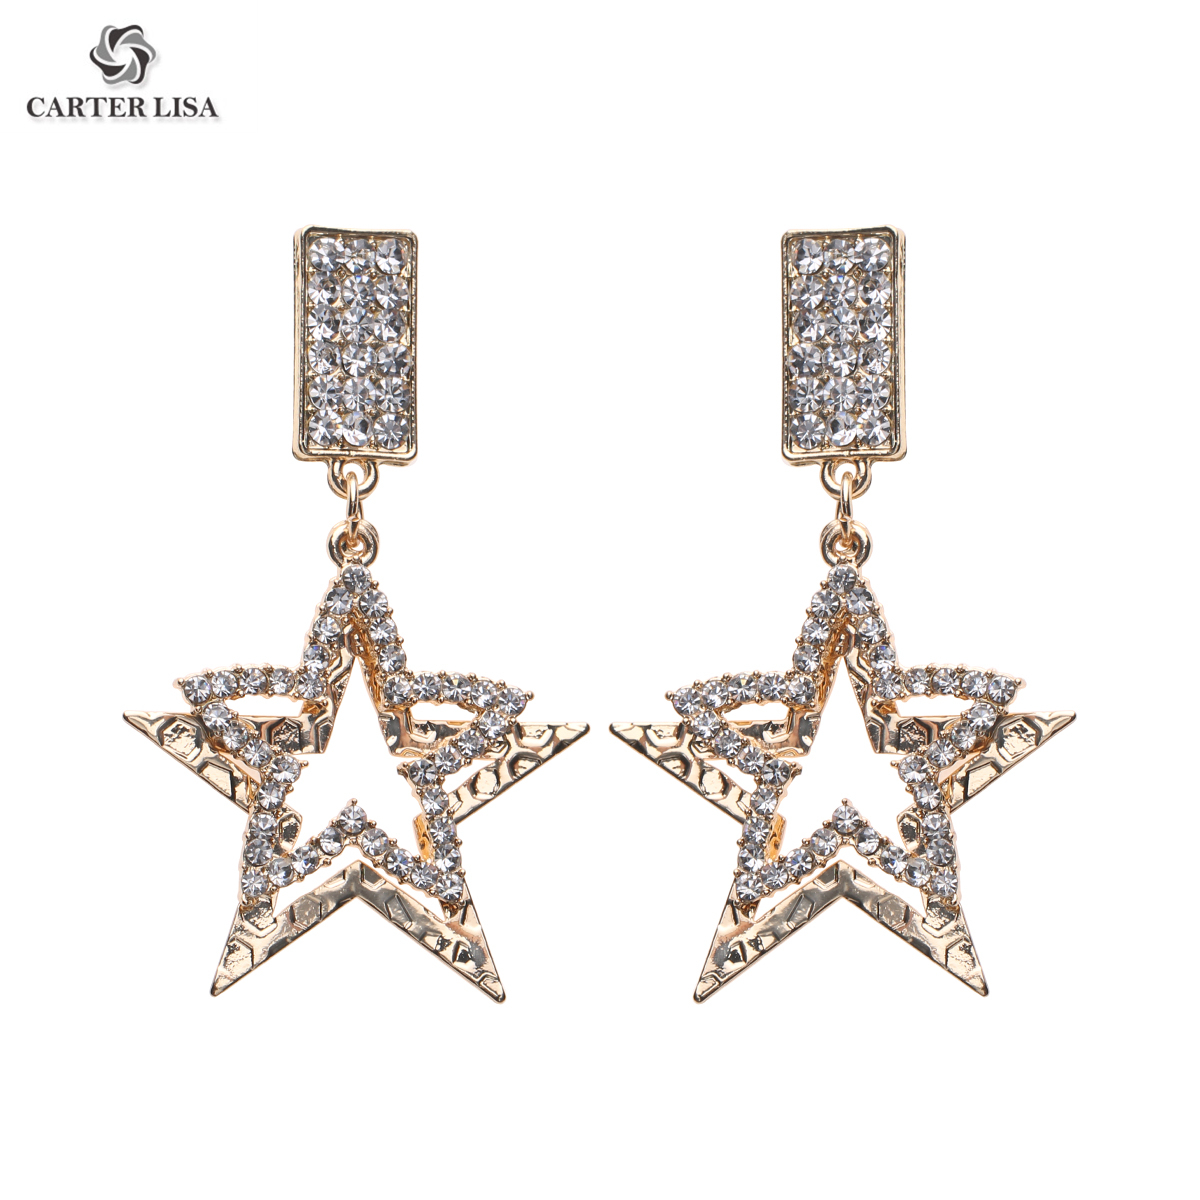 CARTER LISA Crystal Rhinestone Star Pendant Big Dangle Drop Earrings Jewelry Women Fashion Statement Earrings Accessories